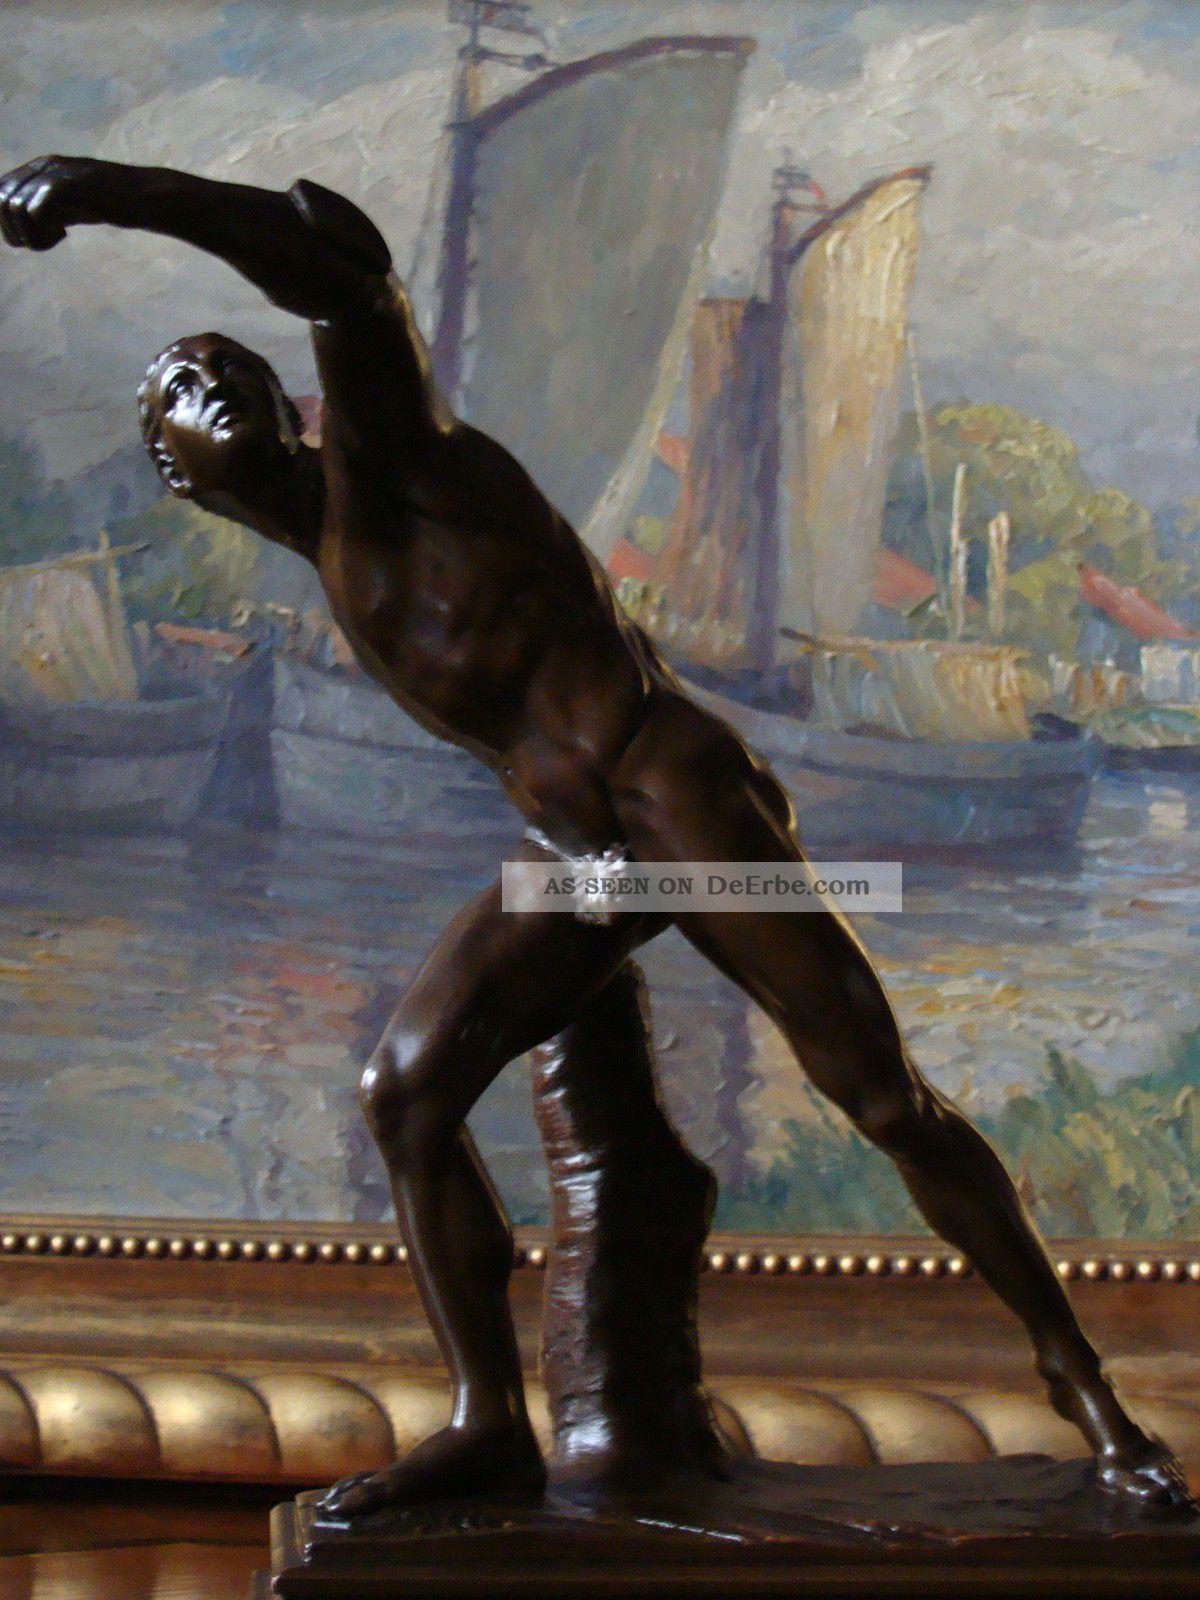 Der Fechter Borghese Bronze Figur Um 1860 Athlet Gladiator Römer Krieger Kämpfer Vor 1900 Bild